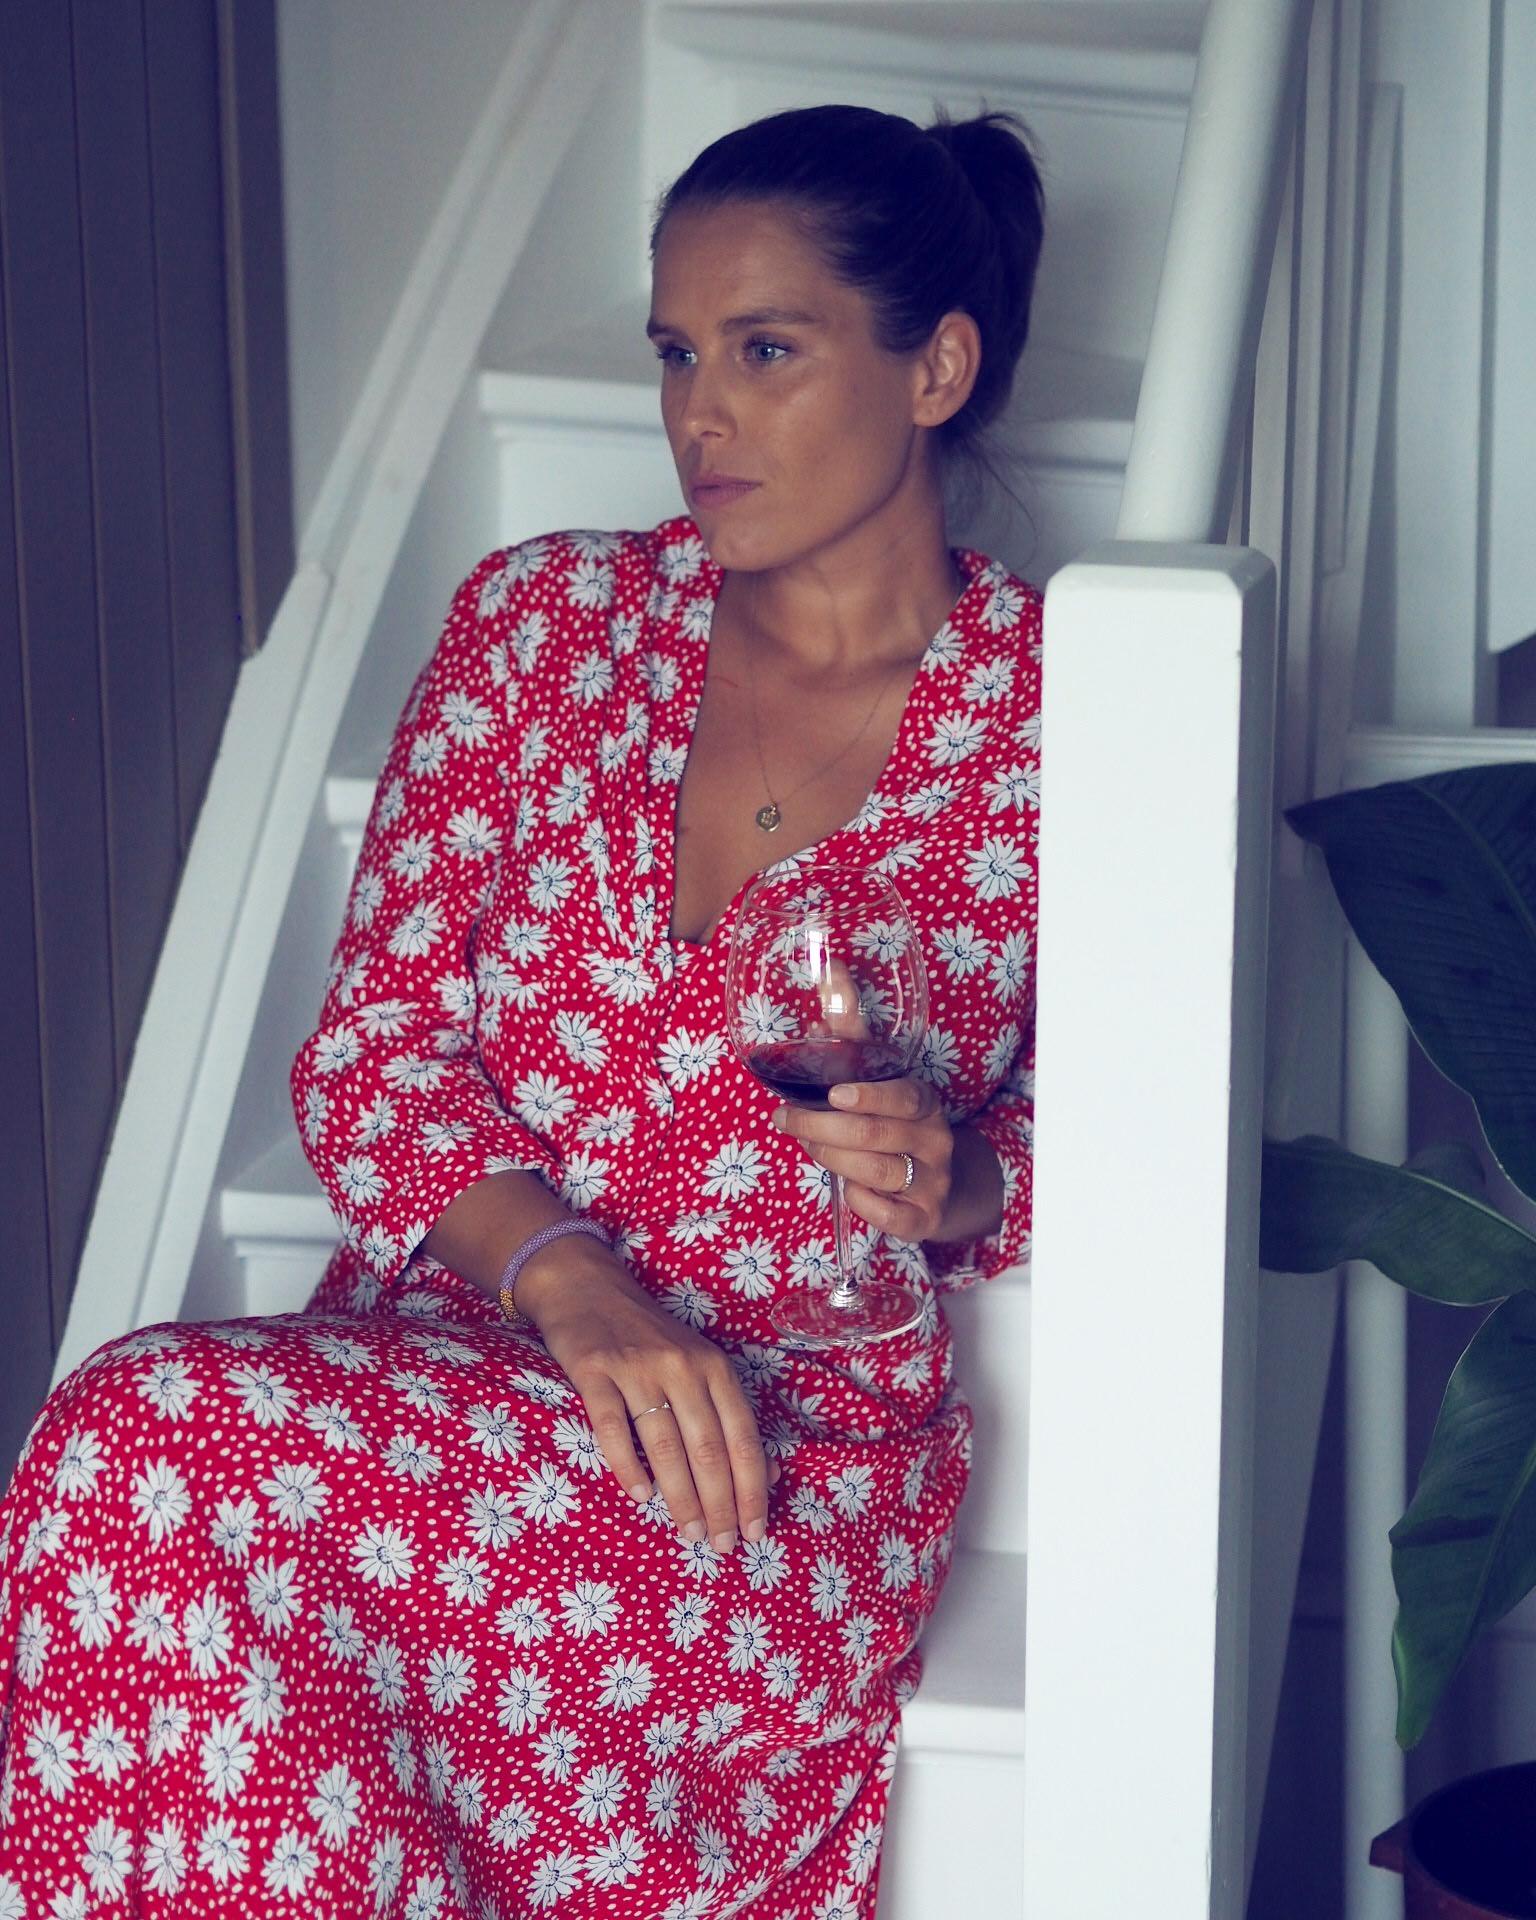 Summer dress: Zara / Photo: Nina Isabell Abrahamsen